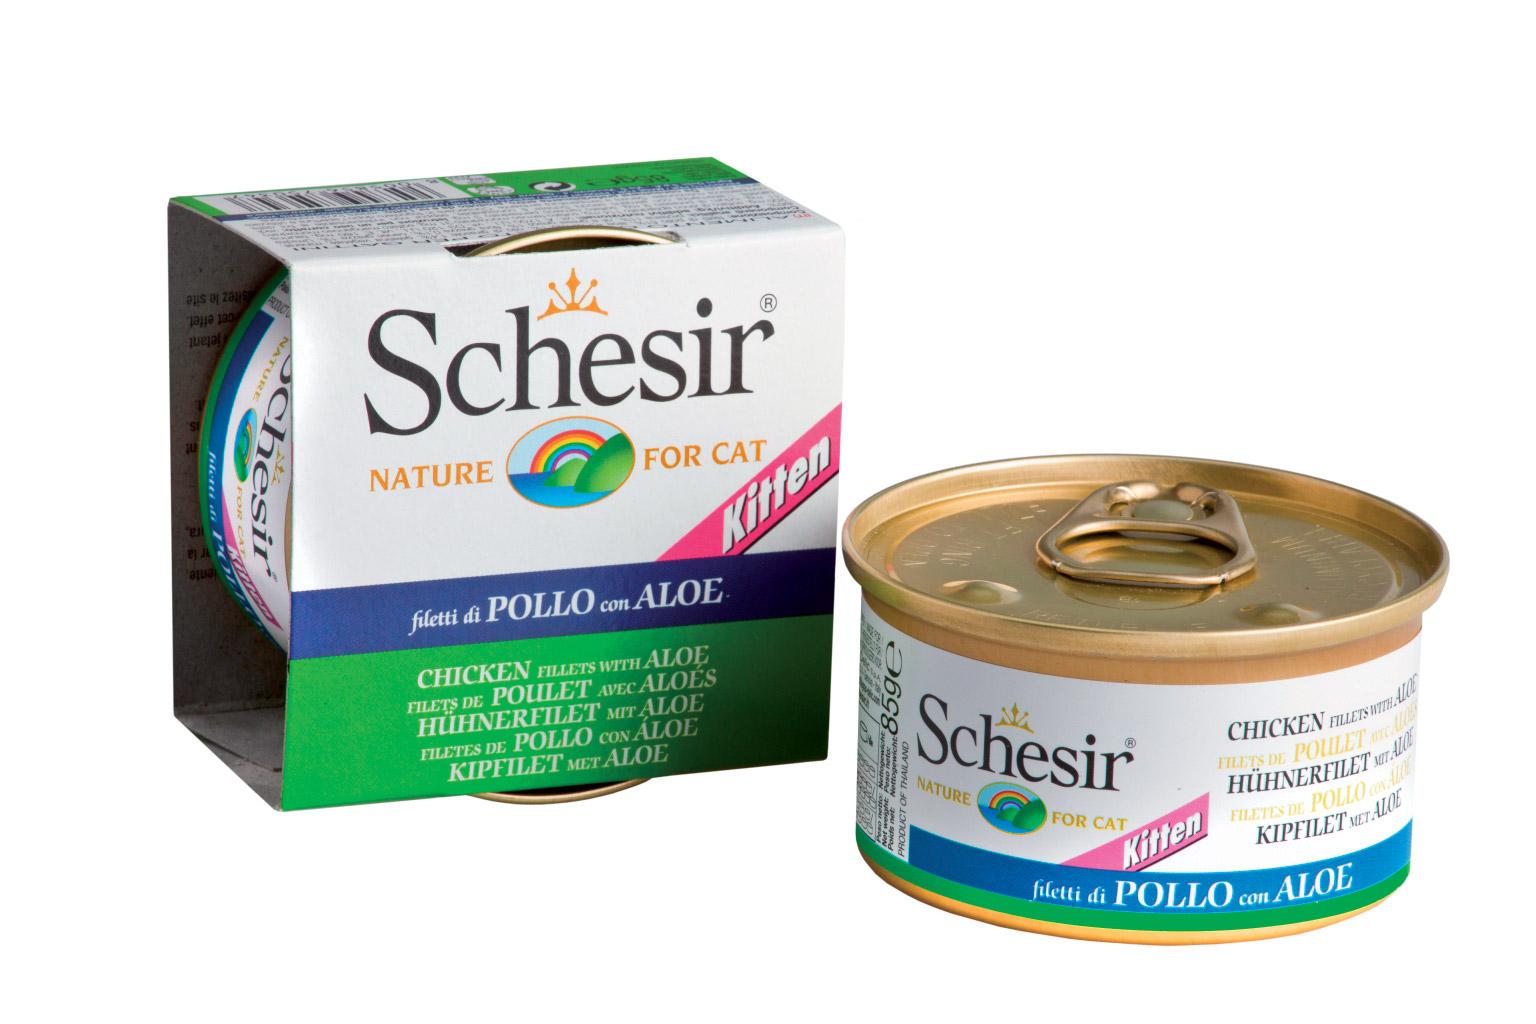 Schesir Dog Food Review